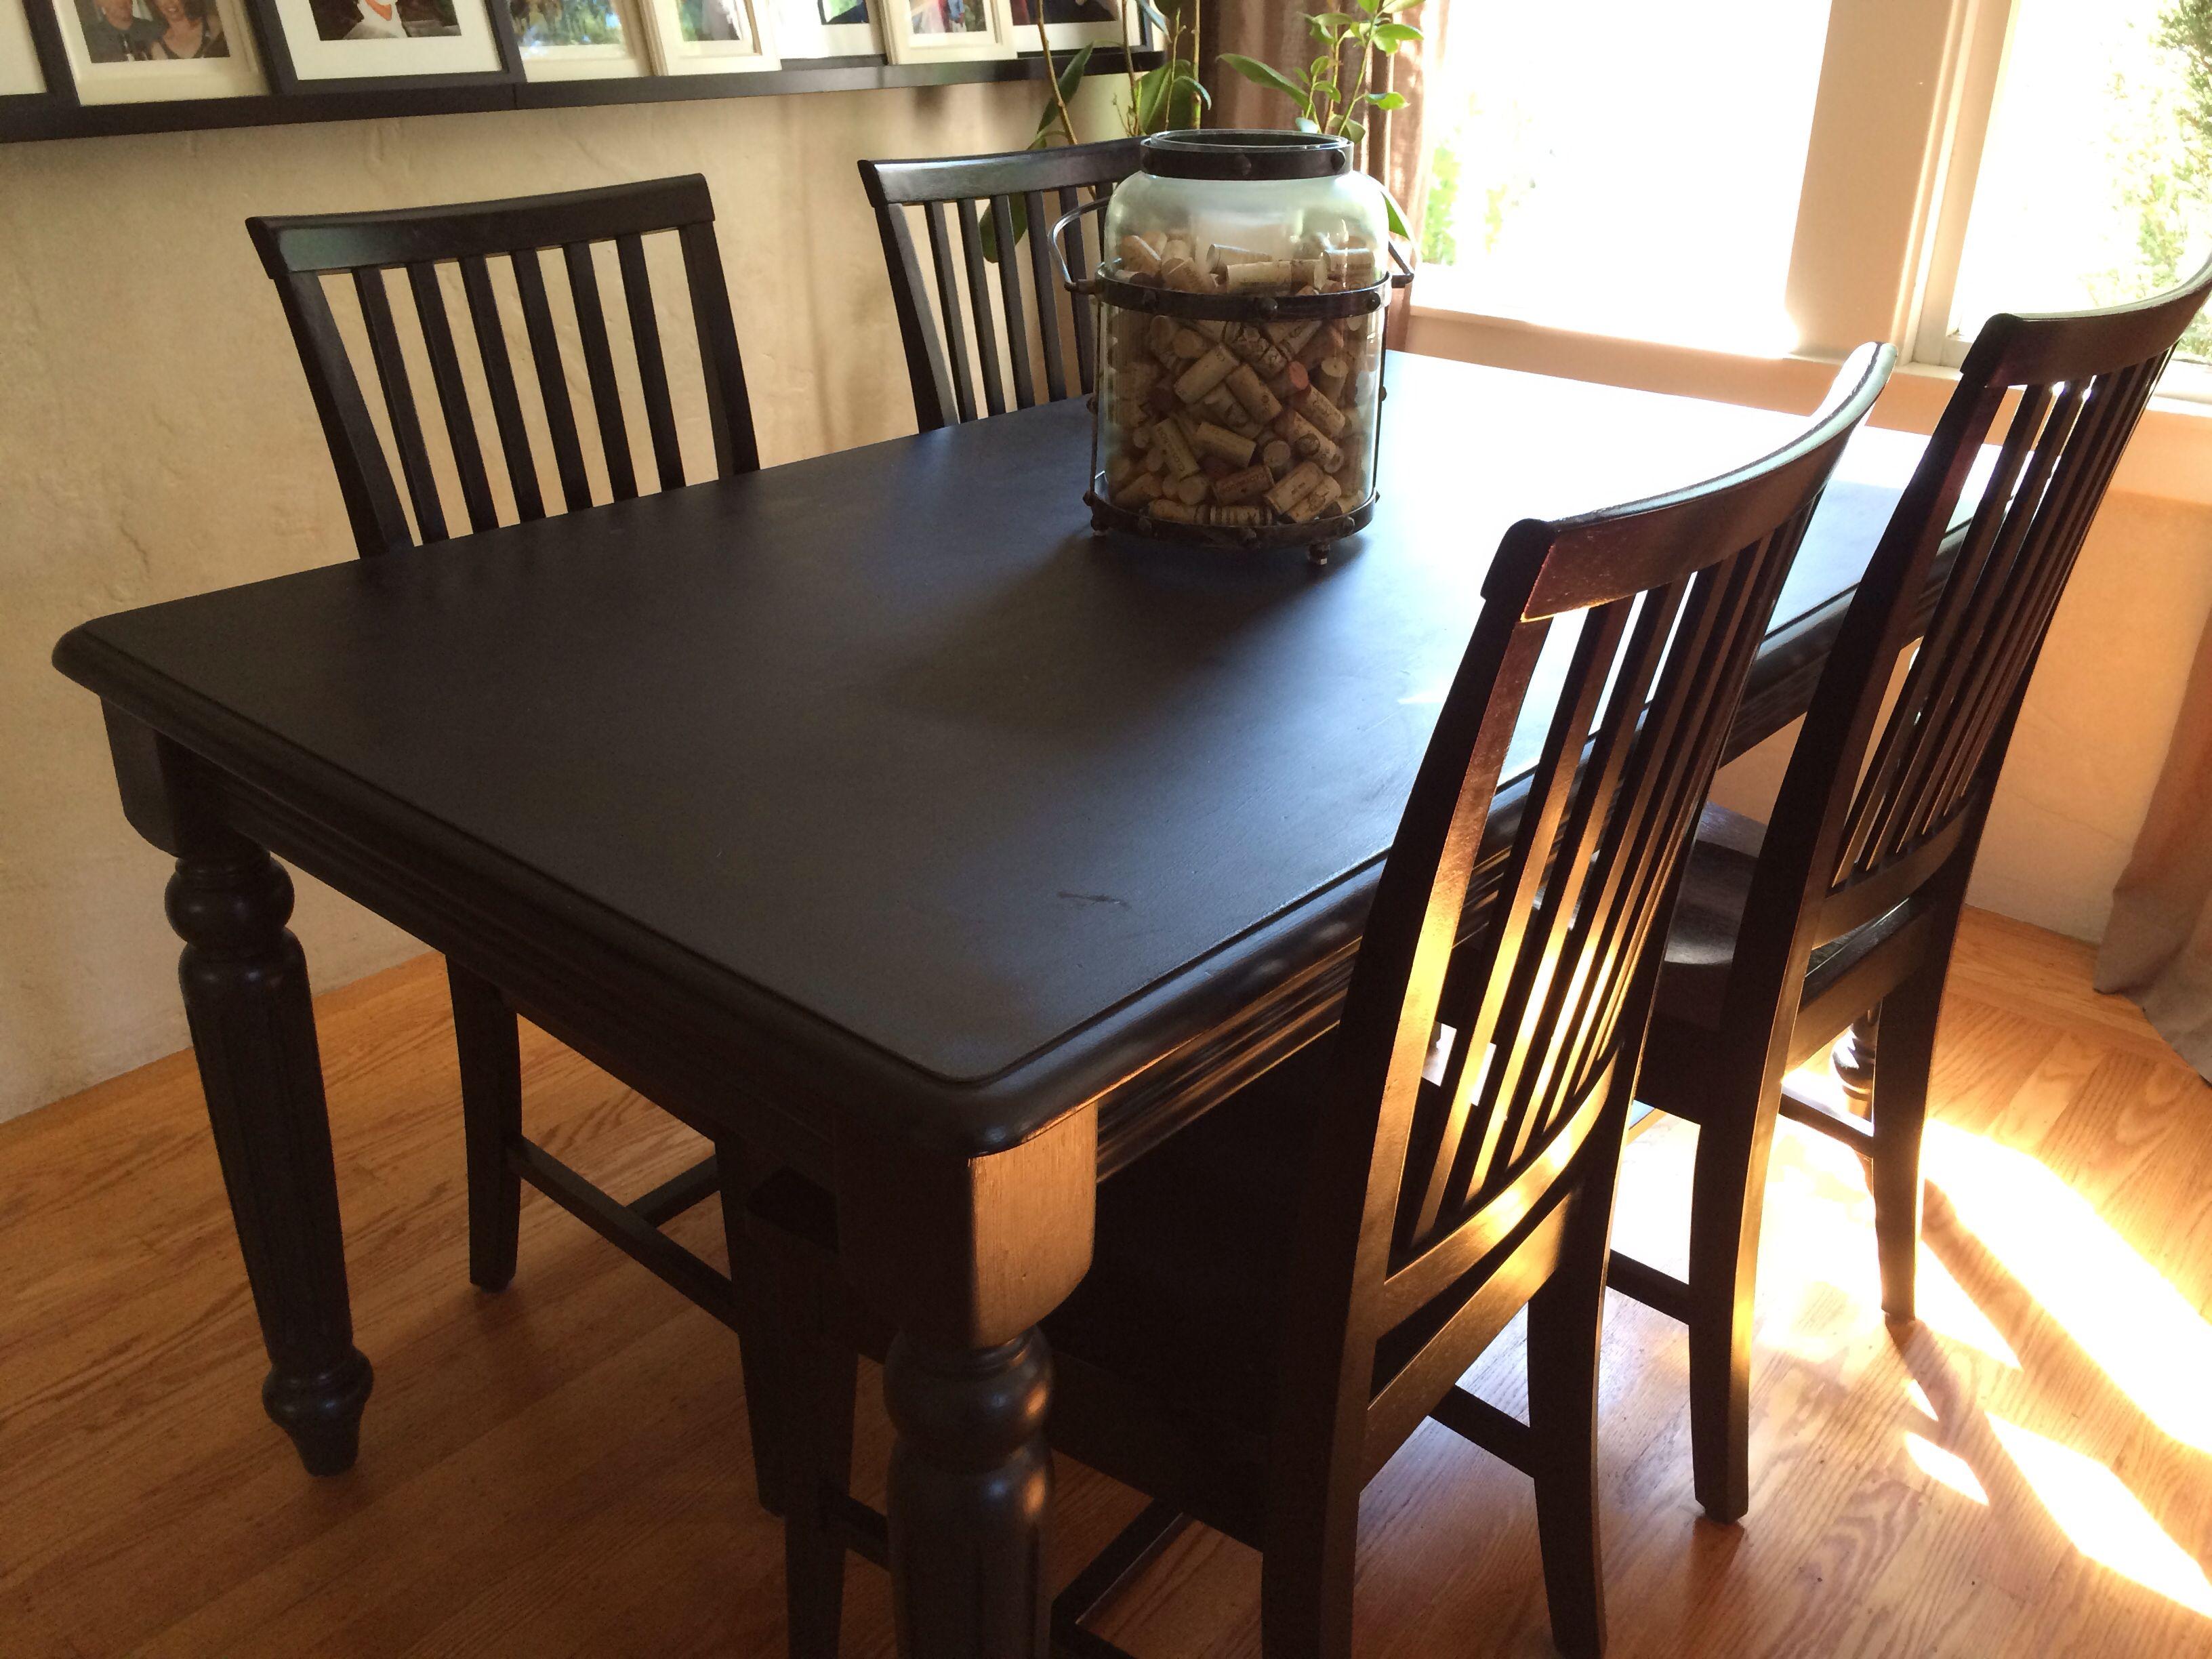 Vintage Farm Table Painted Black Seats Sixsince Our Dining Room Fair Dining Room Sets On Craigslist Design Ideas